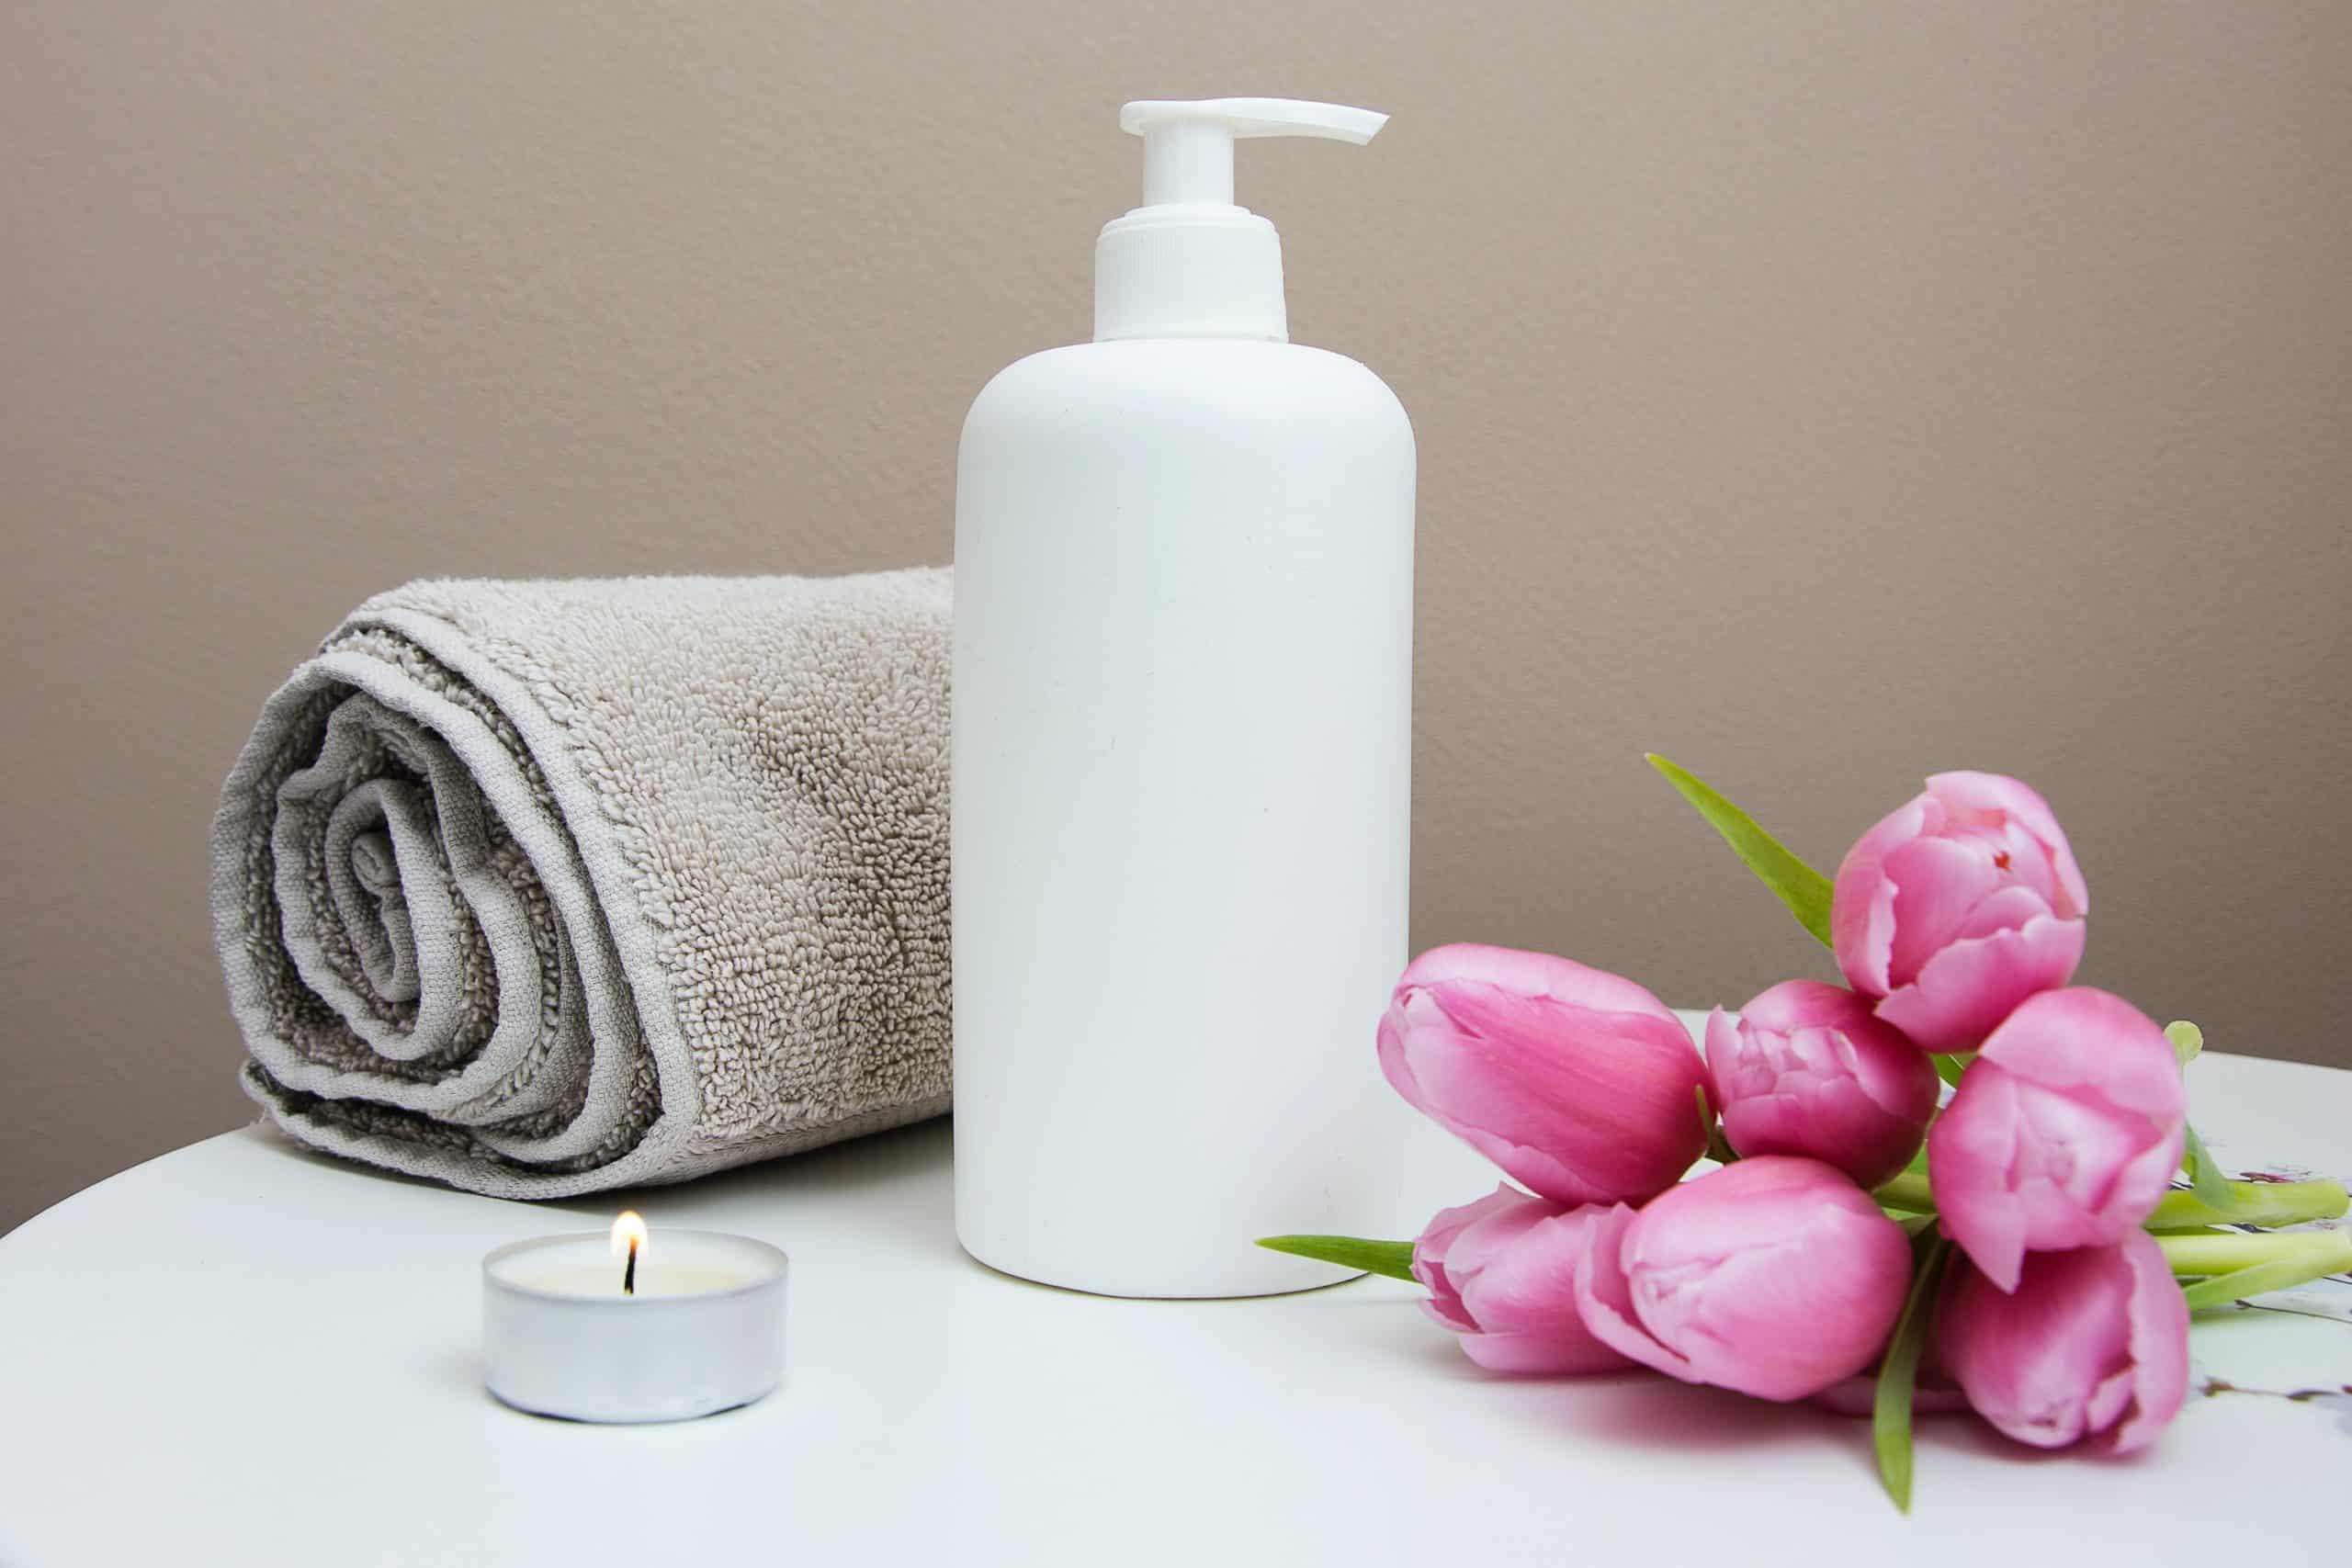 Best Massage course tutorial class certification training online